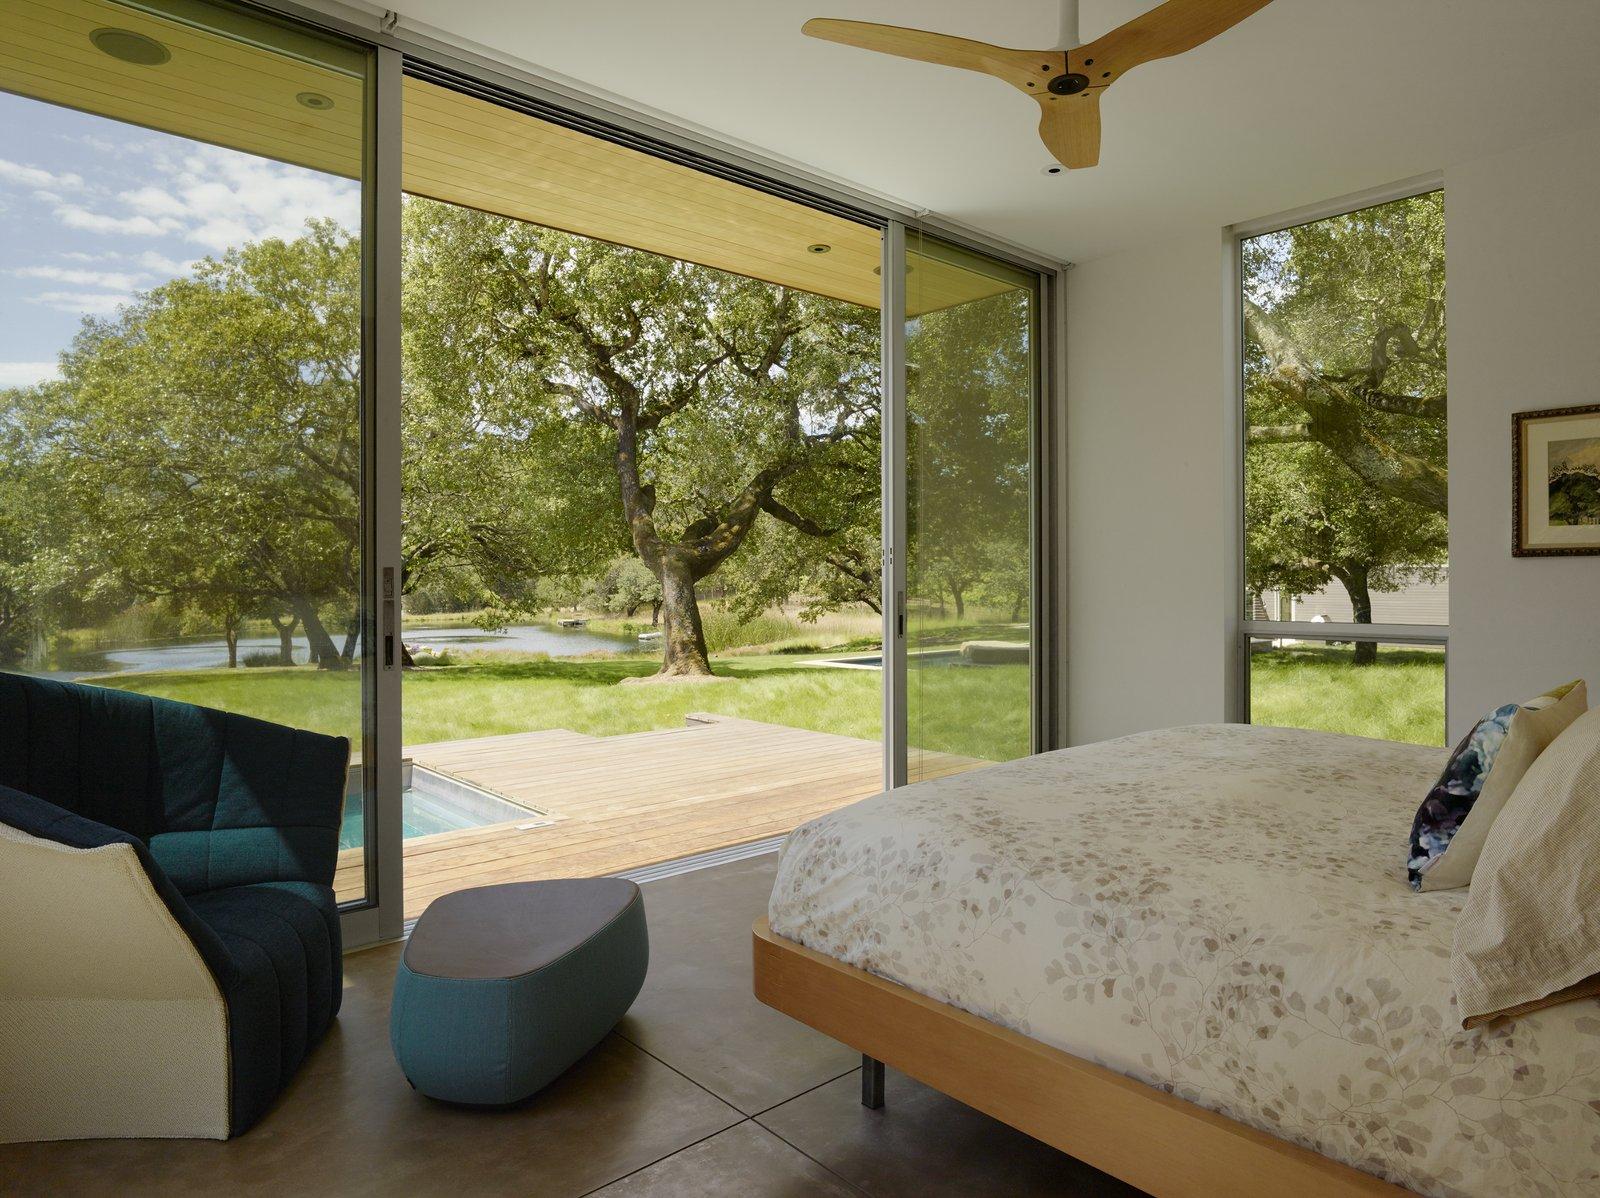 #TurnbullGriffinHaesloop #interior #bedroom #window #hottub  Sonoma Residence by Turnbull Griffin Haesloop Architects